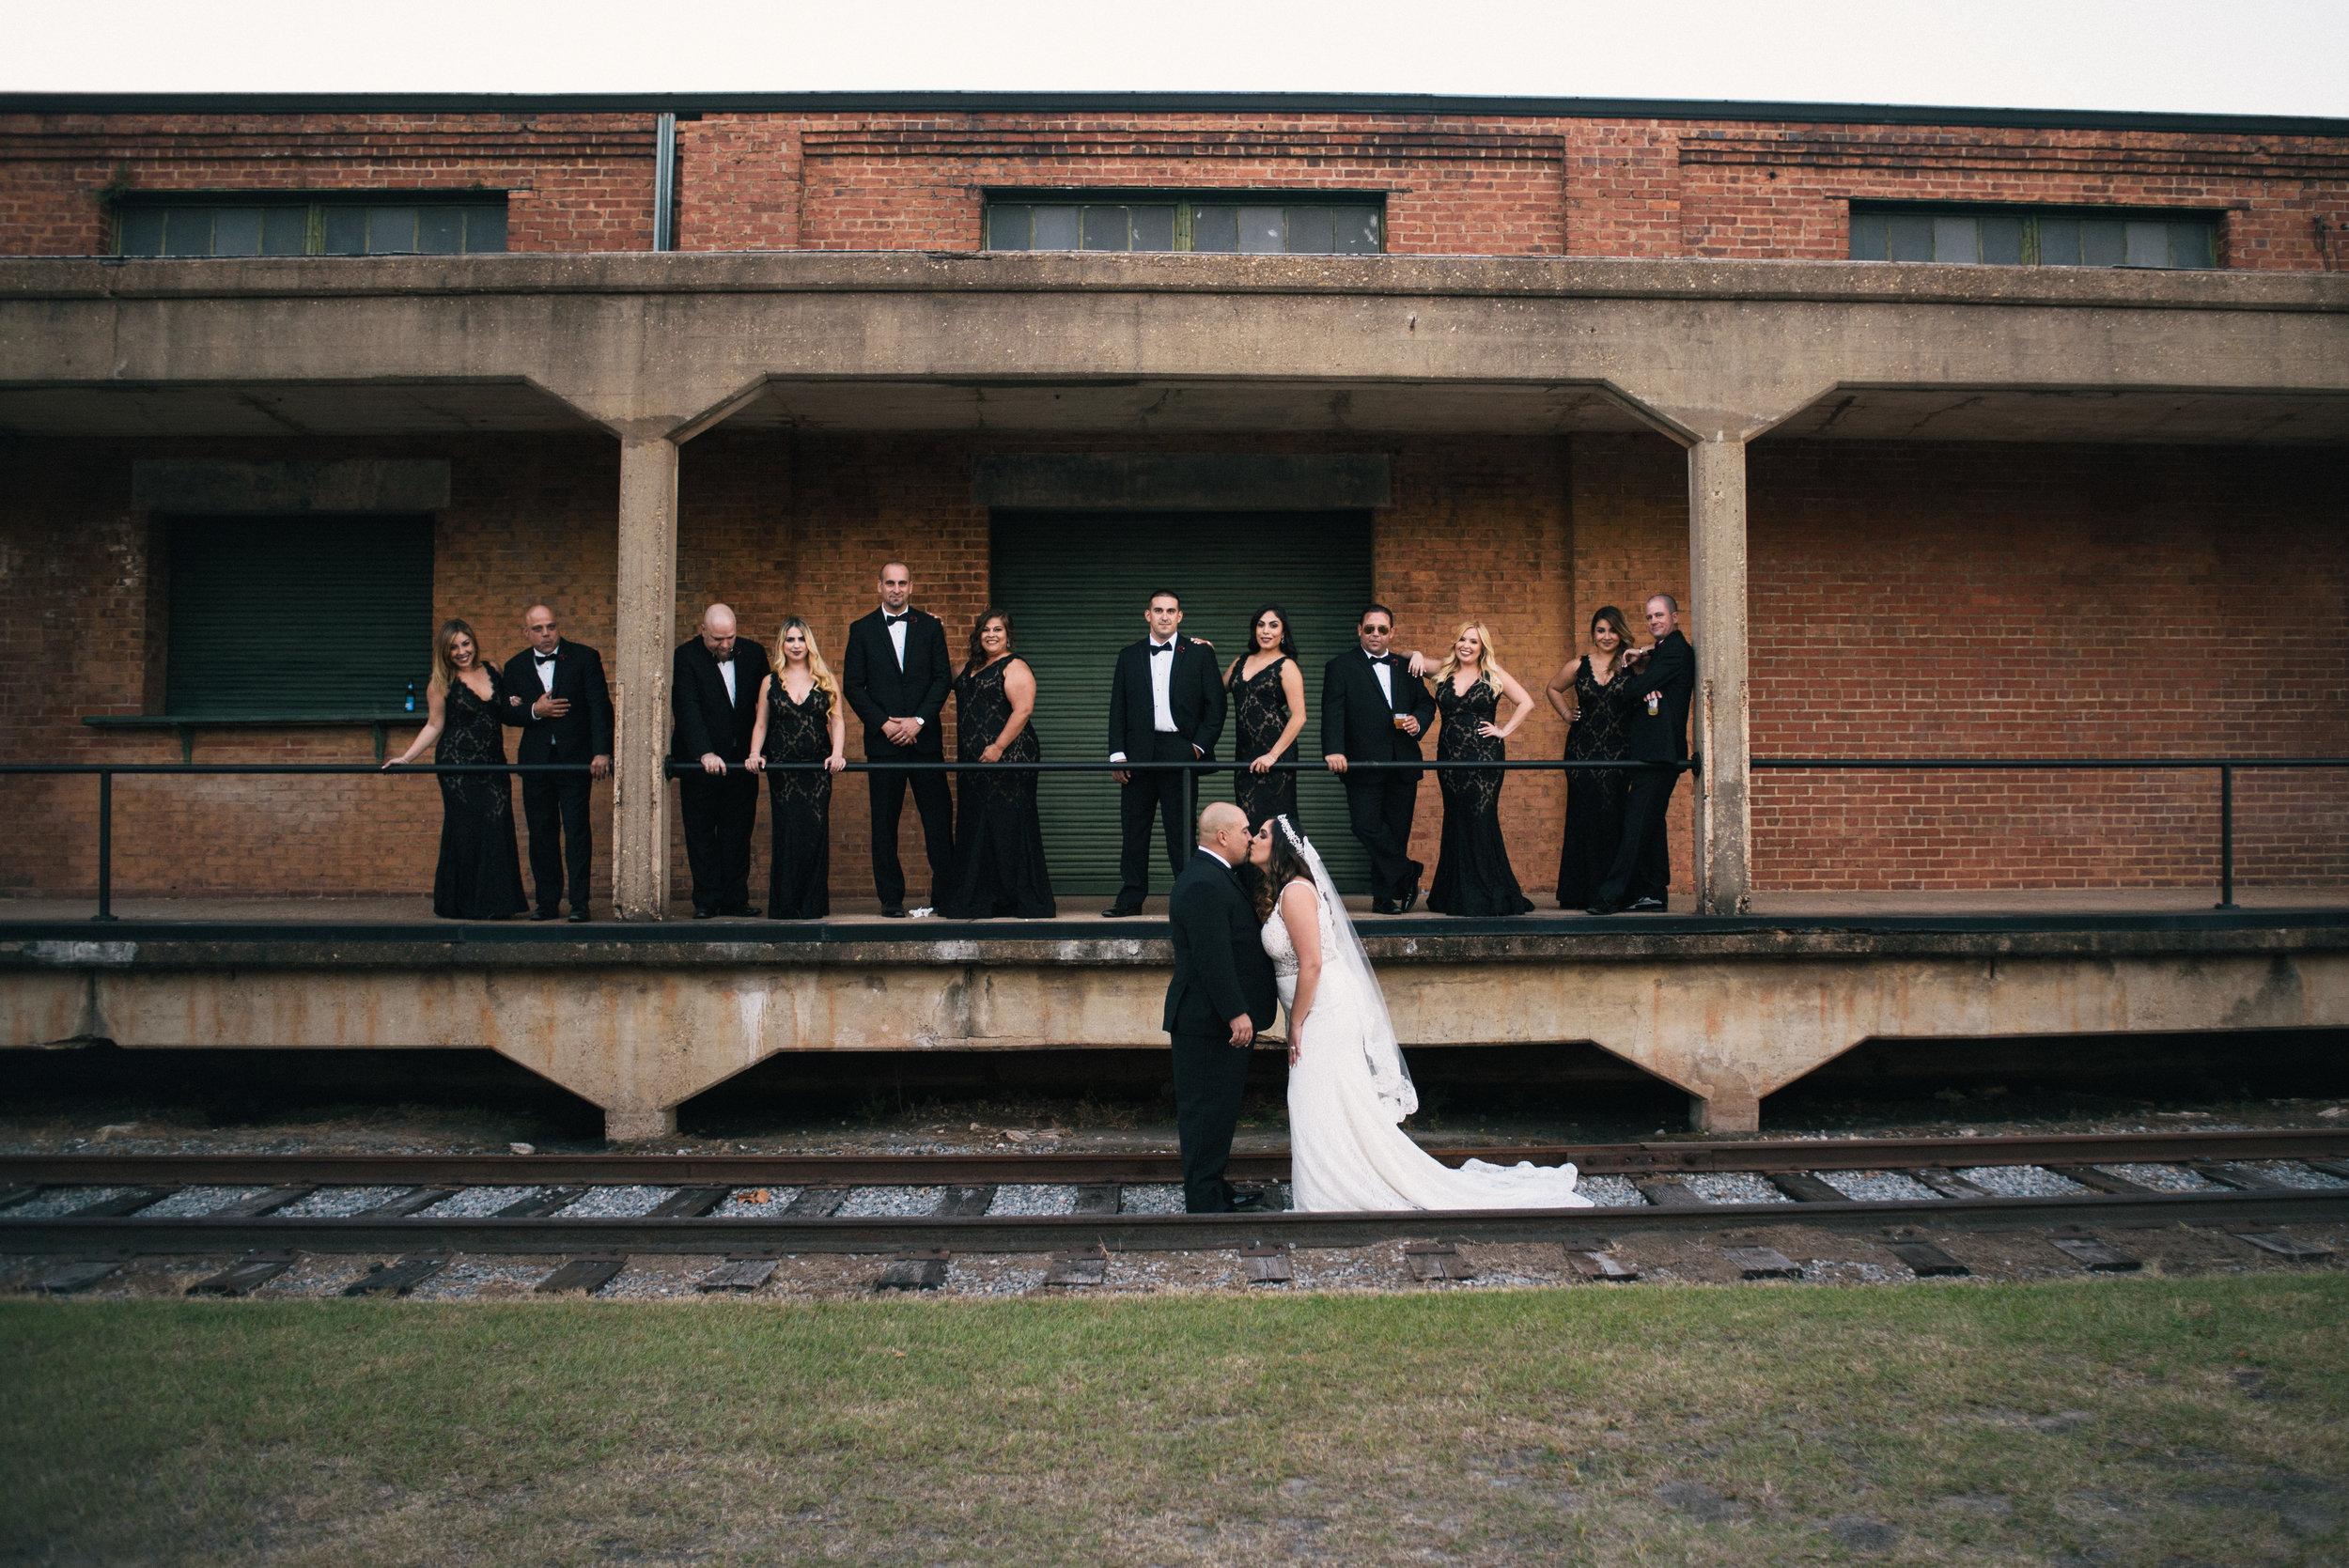 Iggy-and-yesenia-savannah-railroad-museum-wedding-meg-hill-photo- (734 of 1037).jpg